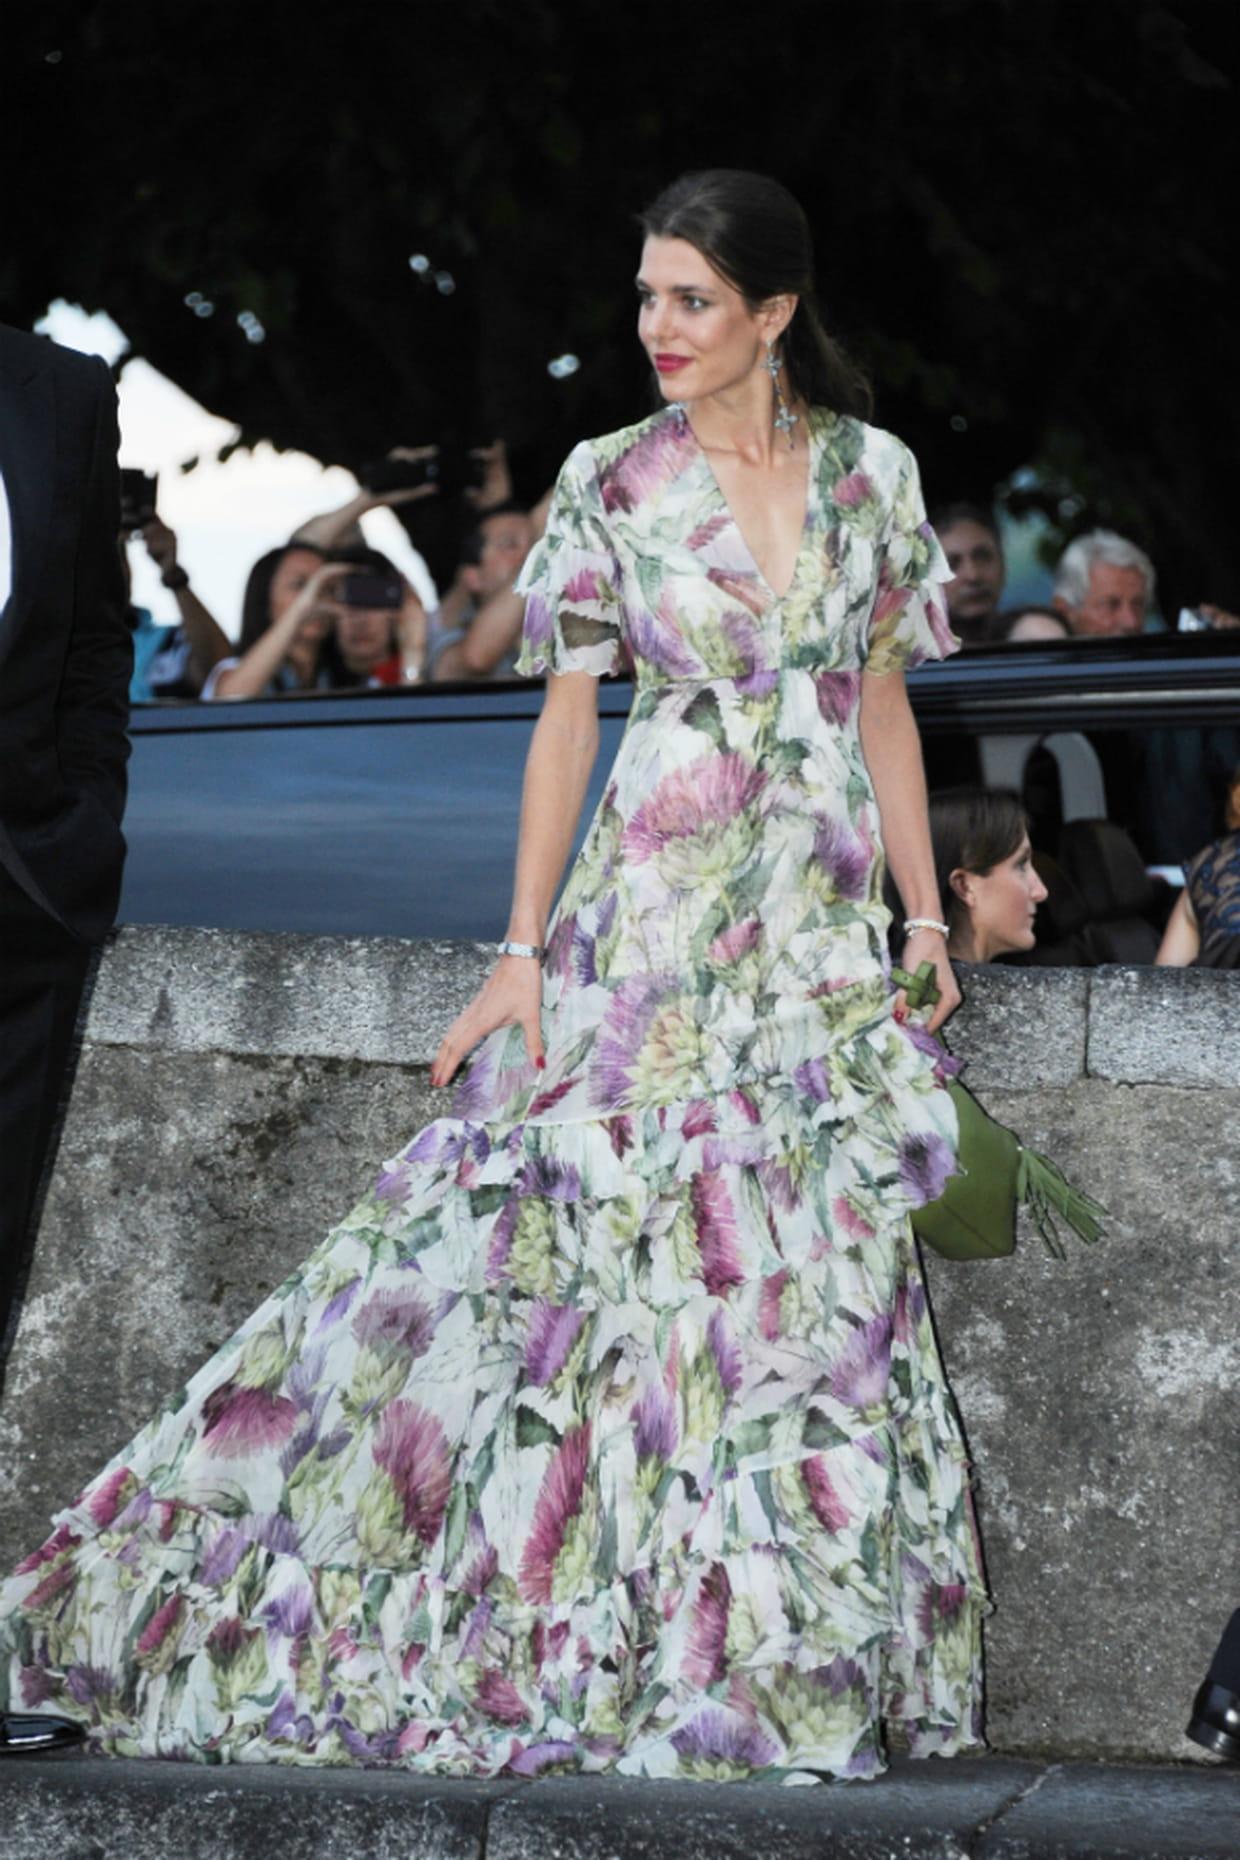 Charlotte Casiraghi En Robe Fluide 224 Fleurs Gucci